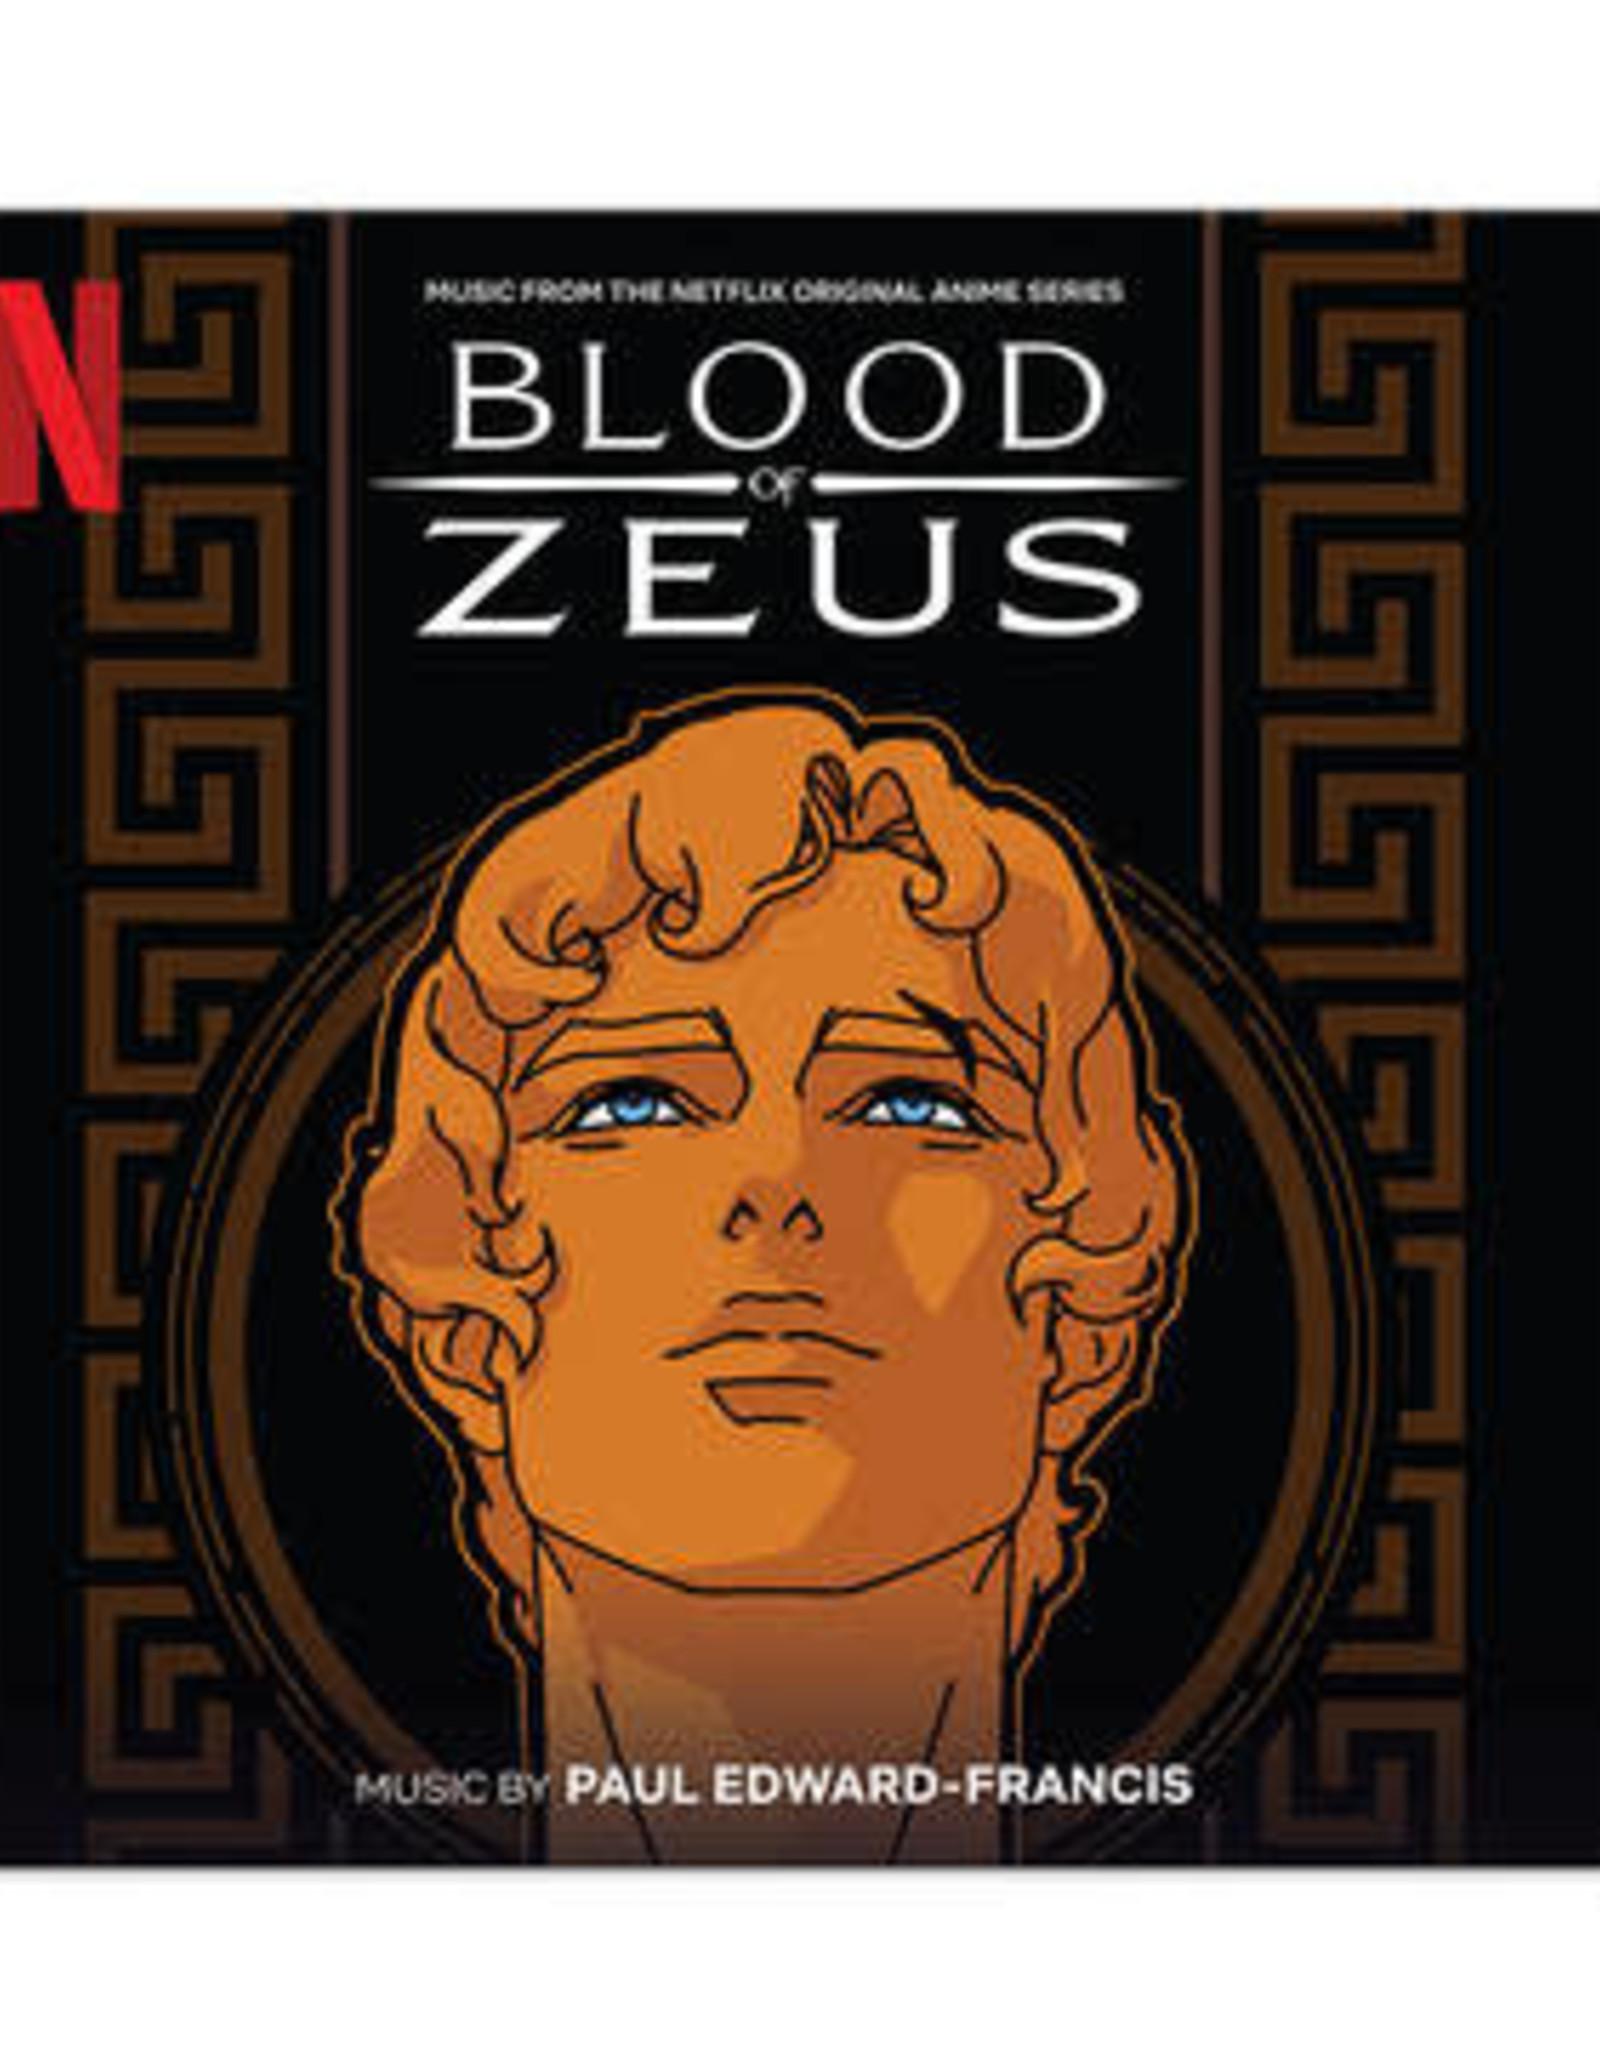 Paul Edward-Francis - Blood Of Zeus (Music From The Netflix Original Anime Series) (2Lp/Red & Black Splatter Vinyl)(RSD 6/21)